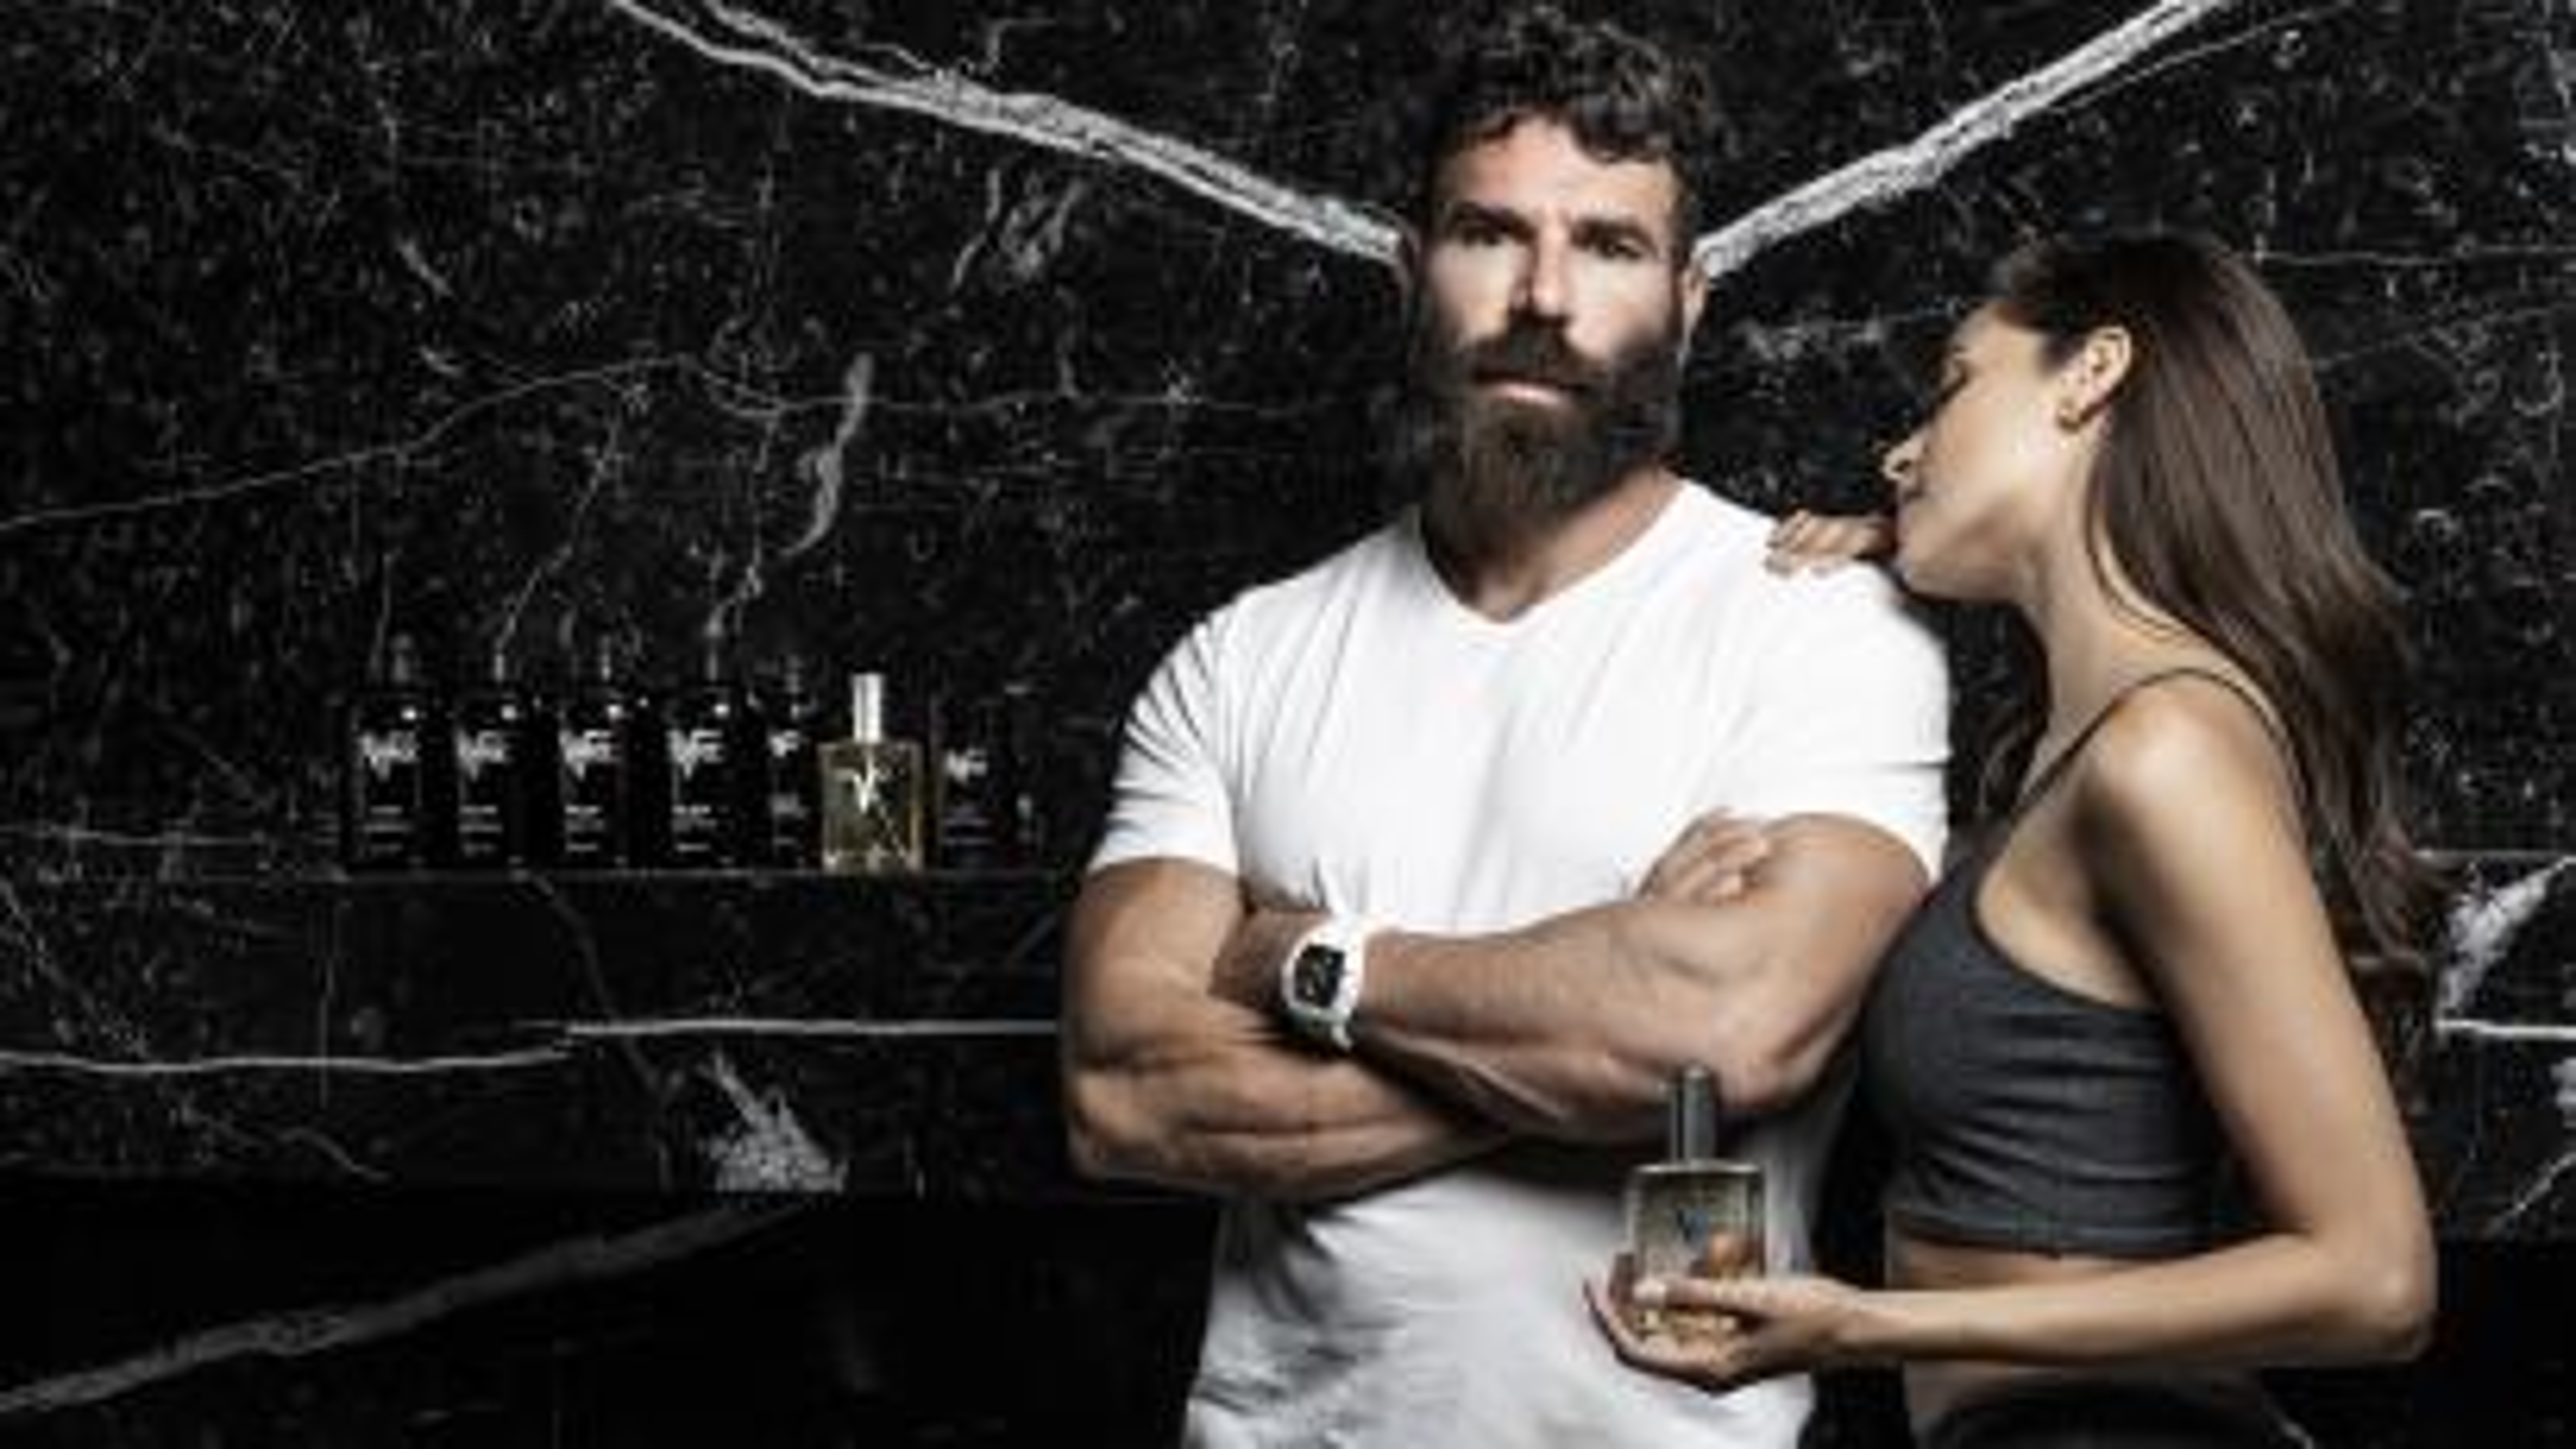 Dan Bilzerian is getting into the men's beauty business — Quartzy